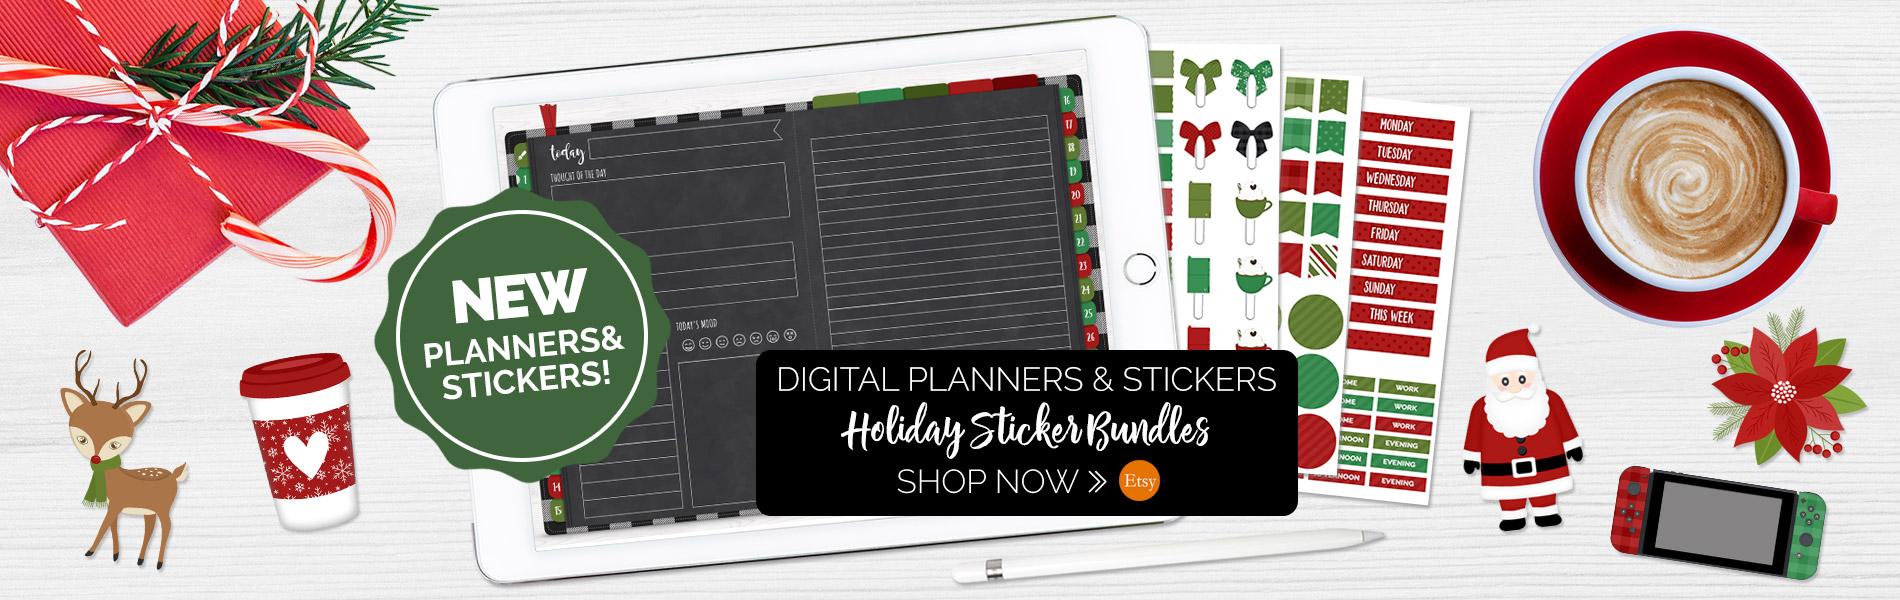 DPC Digitals Holiday Digital Sticker Sets